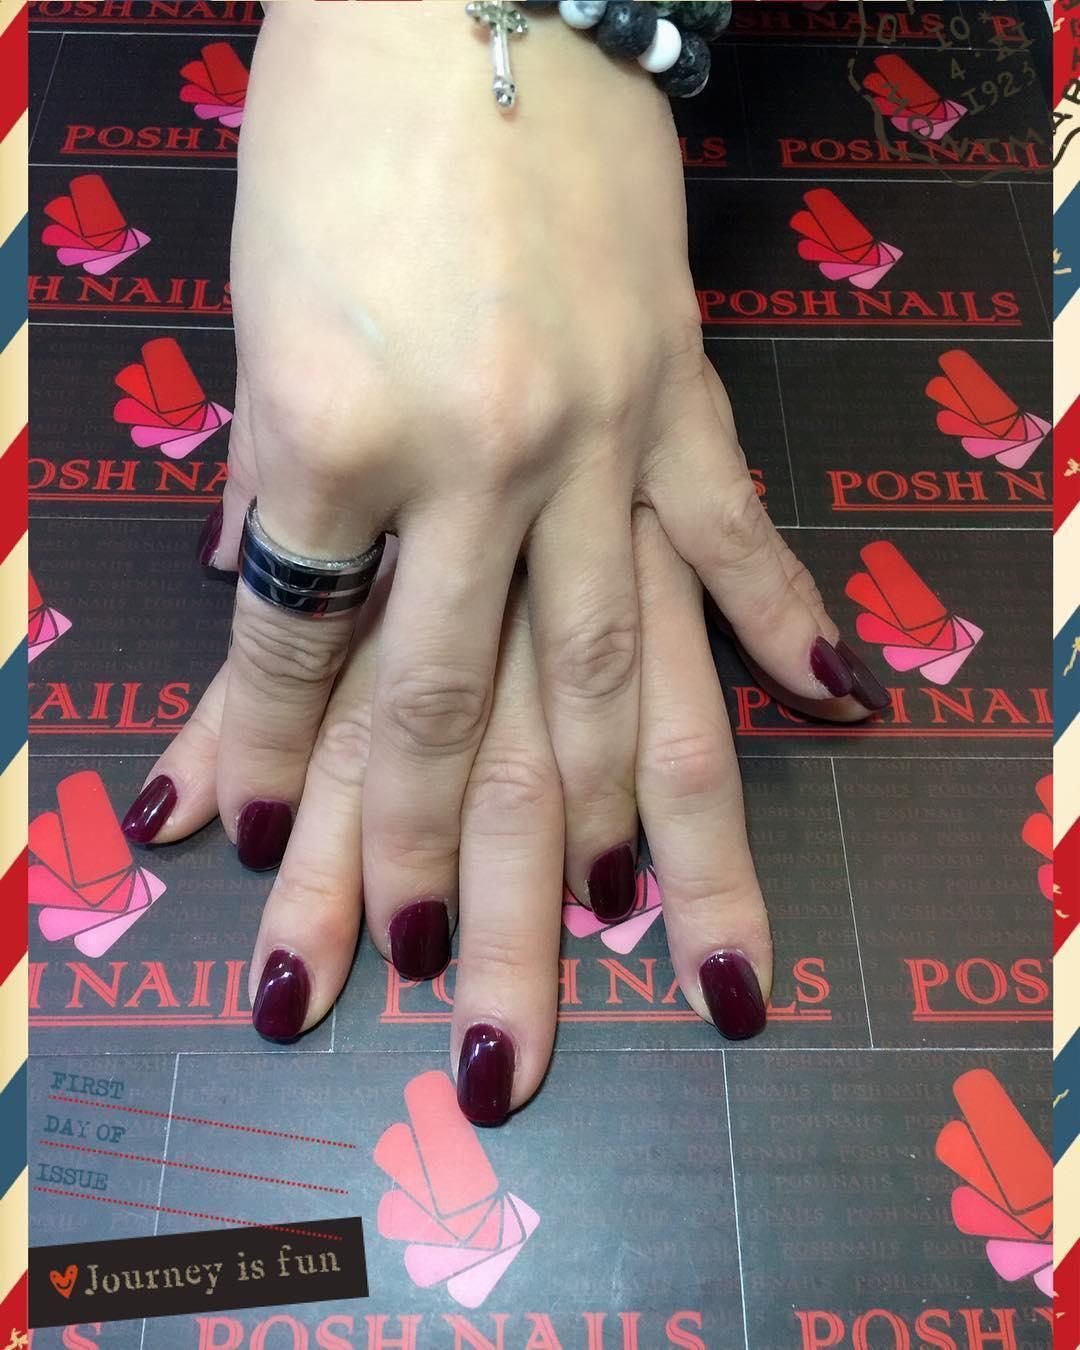 wedding nail designs 13 - 22 Stunning Wedding Nail Designs 2019